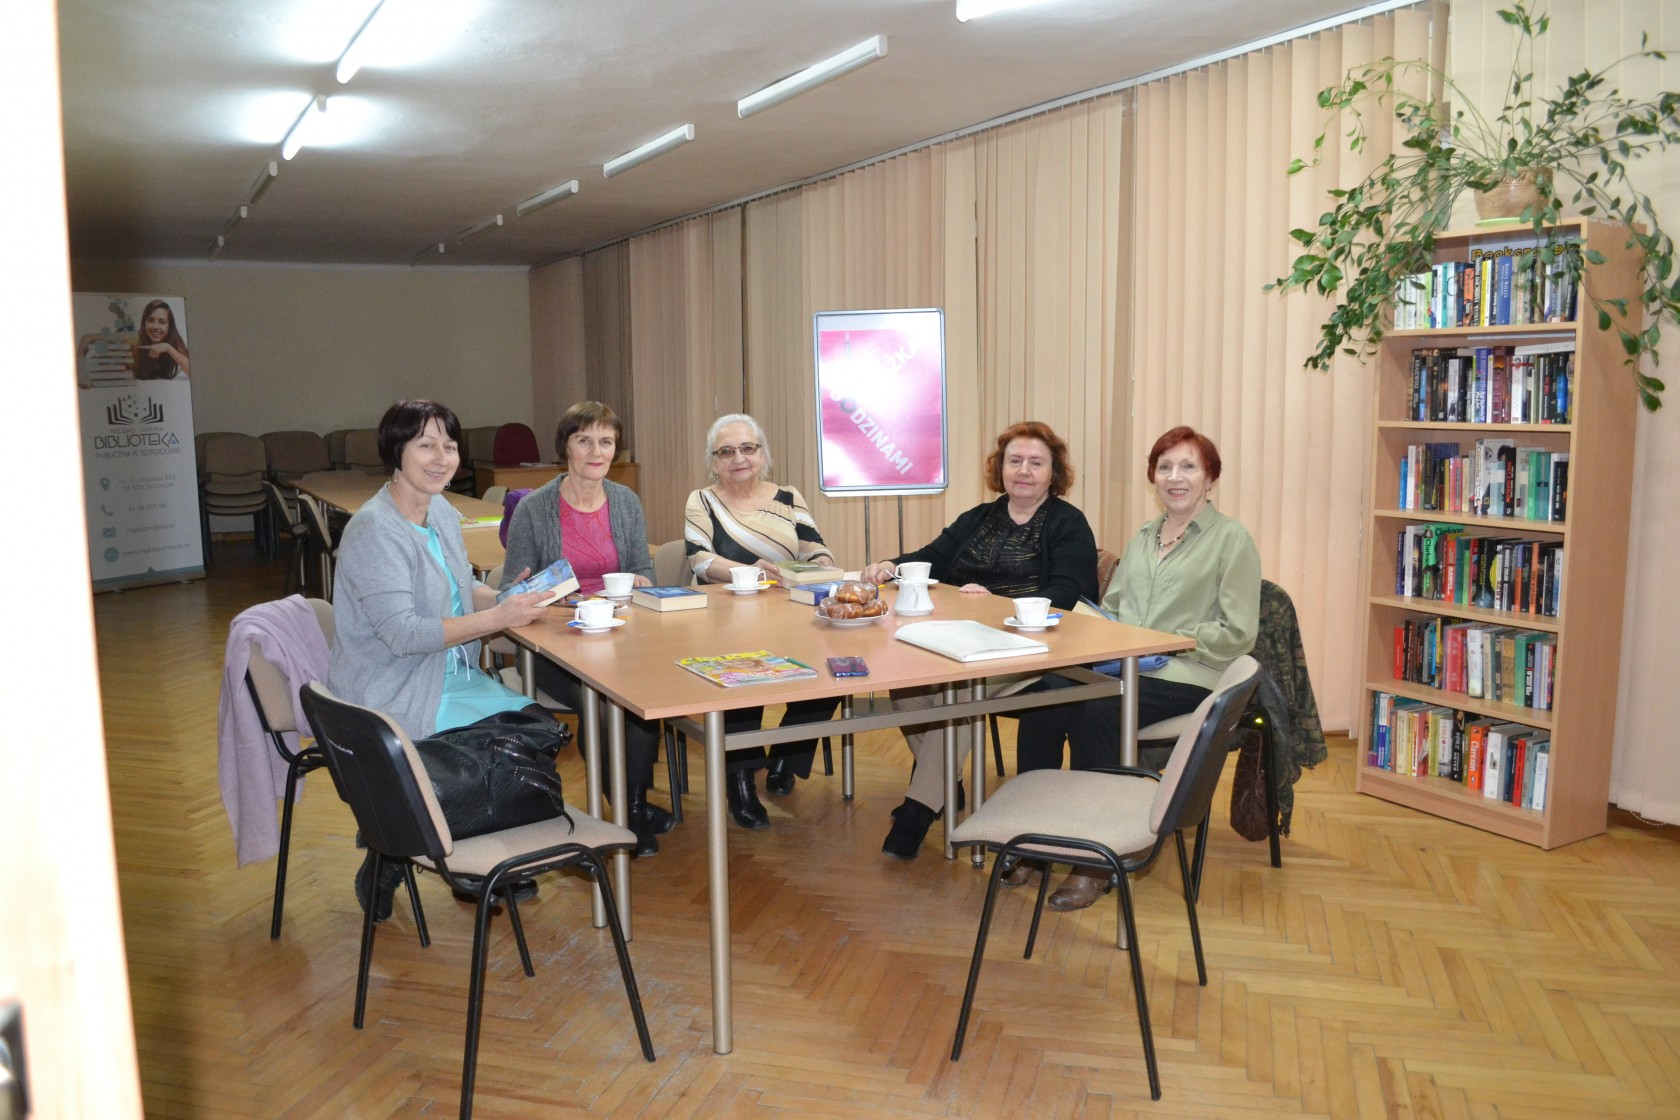 Spotkanie DKK. Luty 2020